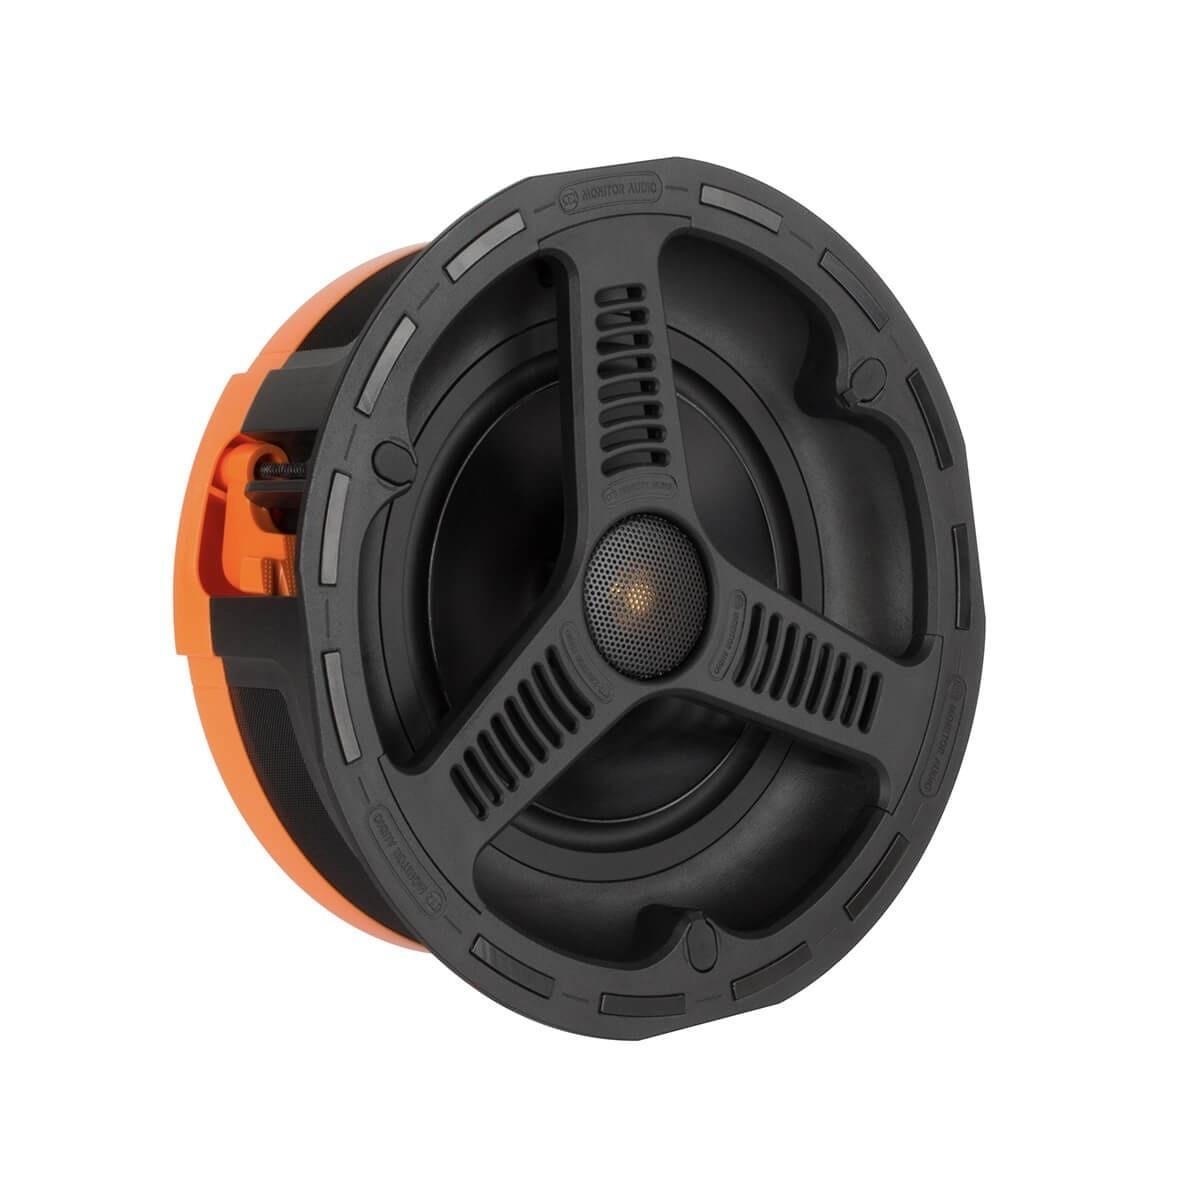 Monitor Audio AWC265 In-Ceiling Speaker